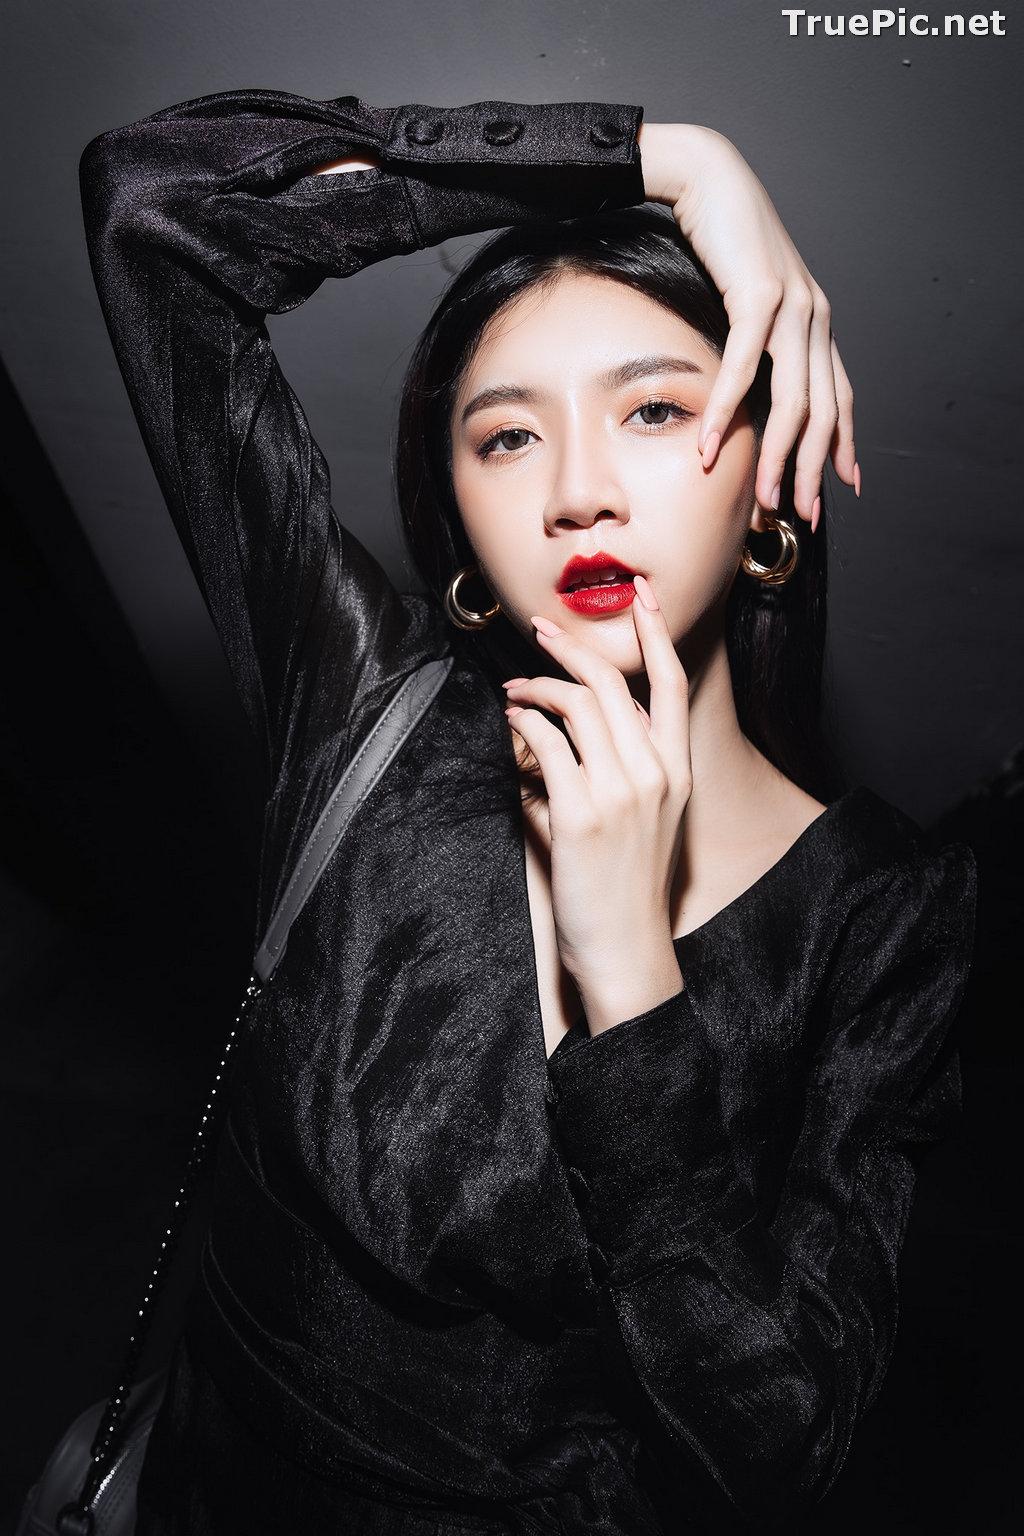 Image Thailand Model - Sasi Ngiunwan - Black For SiamNight - TruePic.net - Picture-9